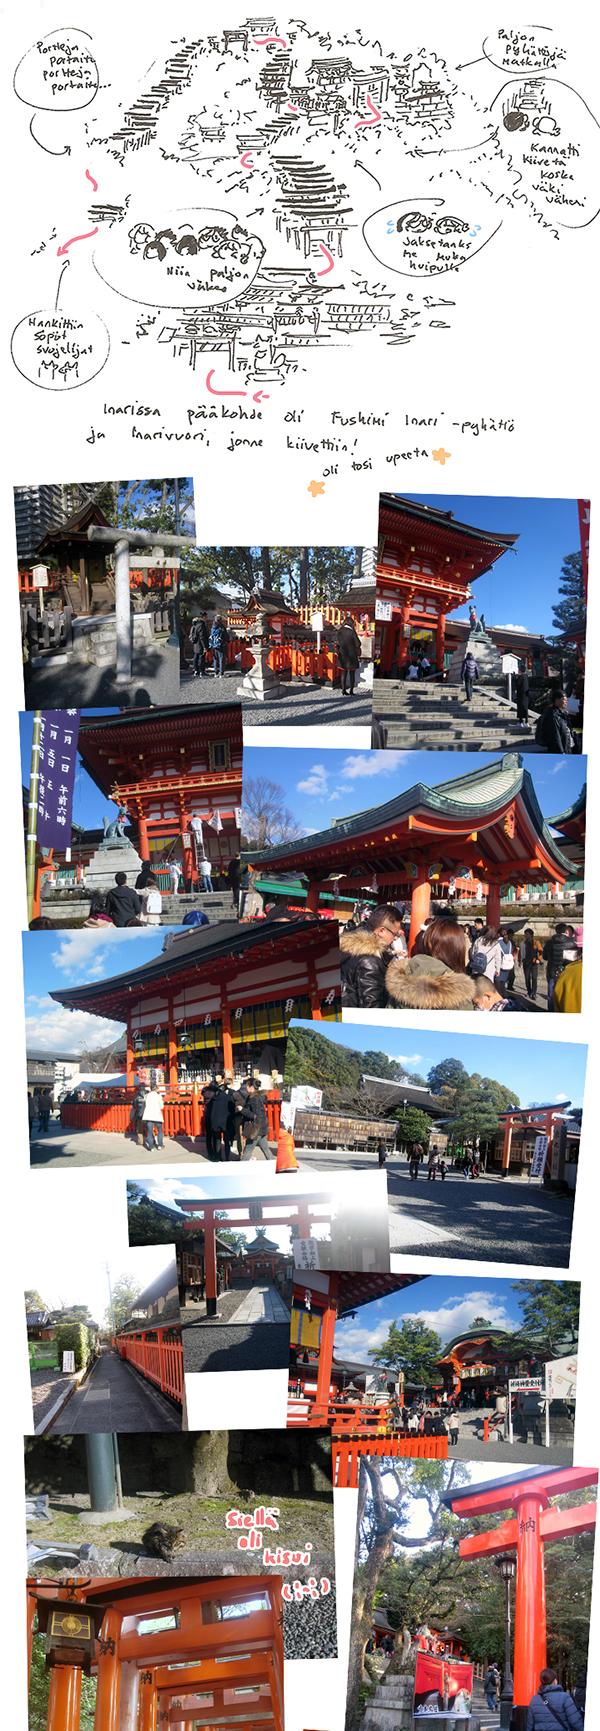 Sarjakuva442 Japanissa 10